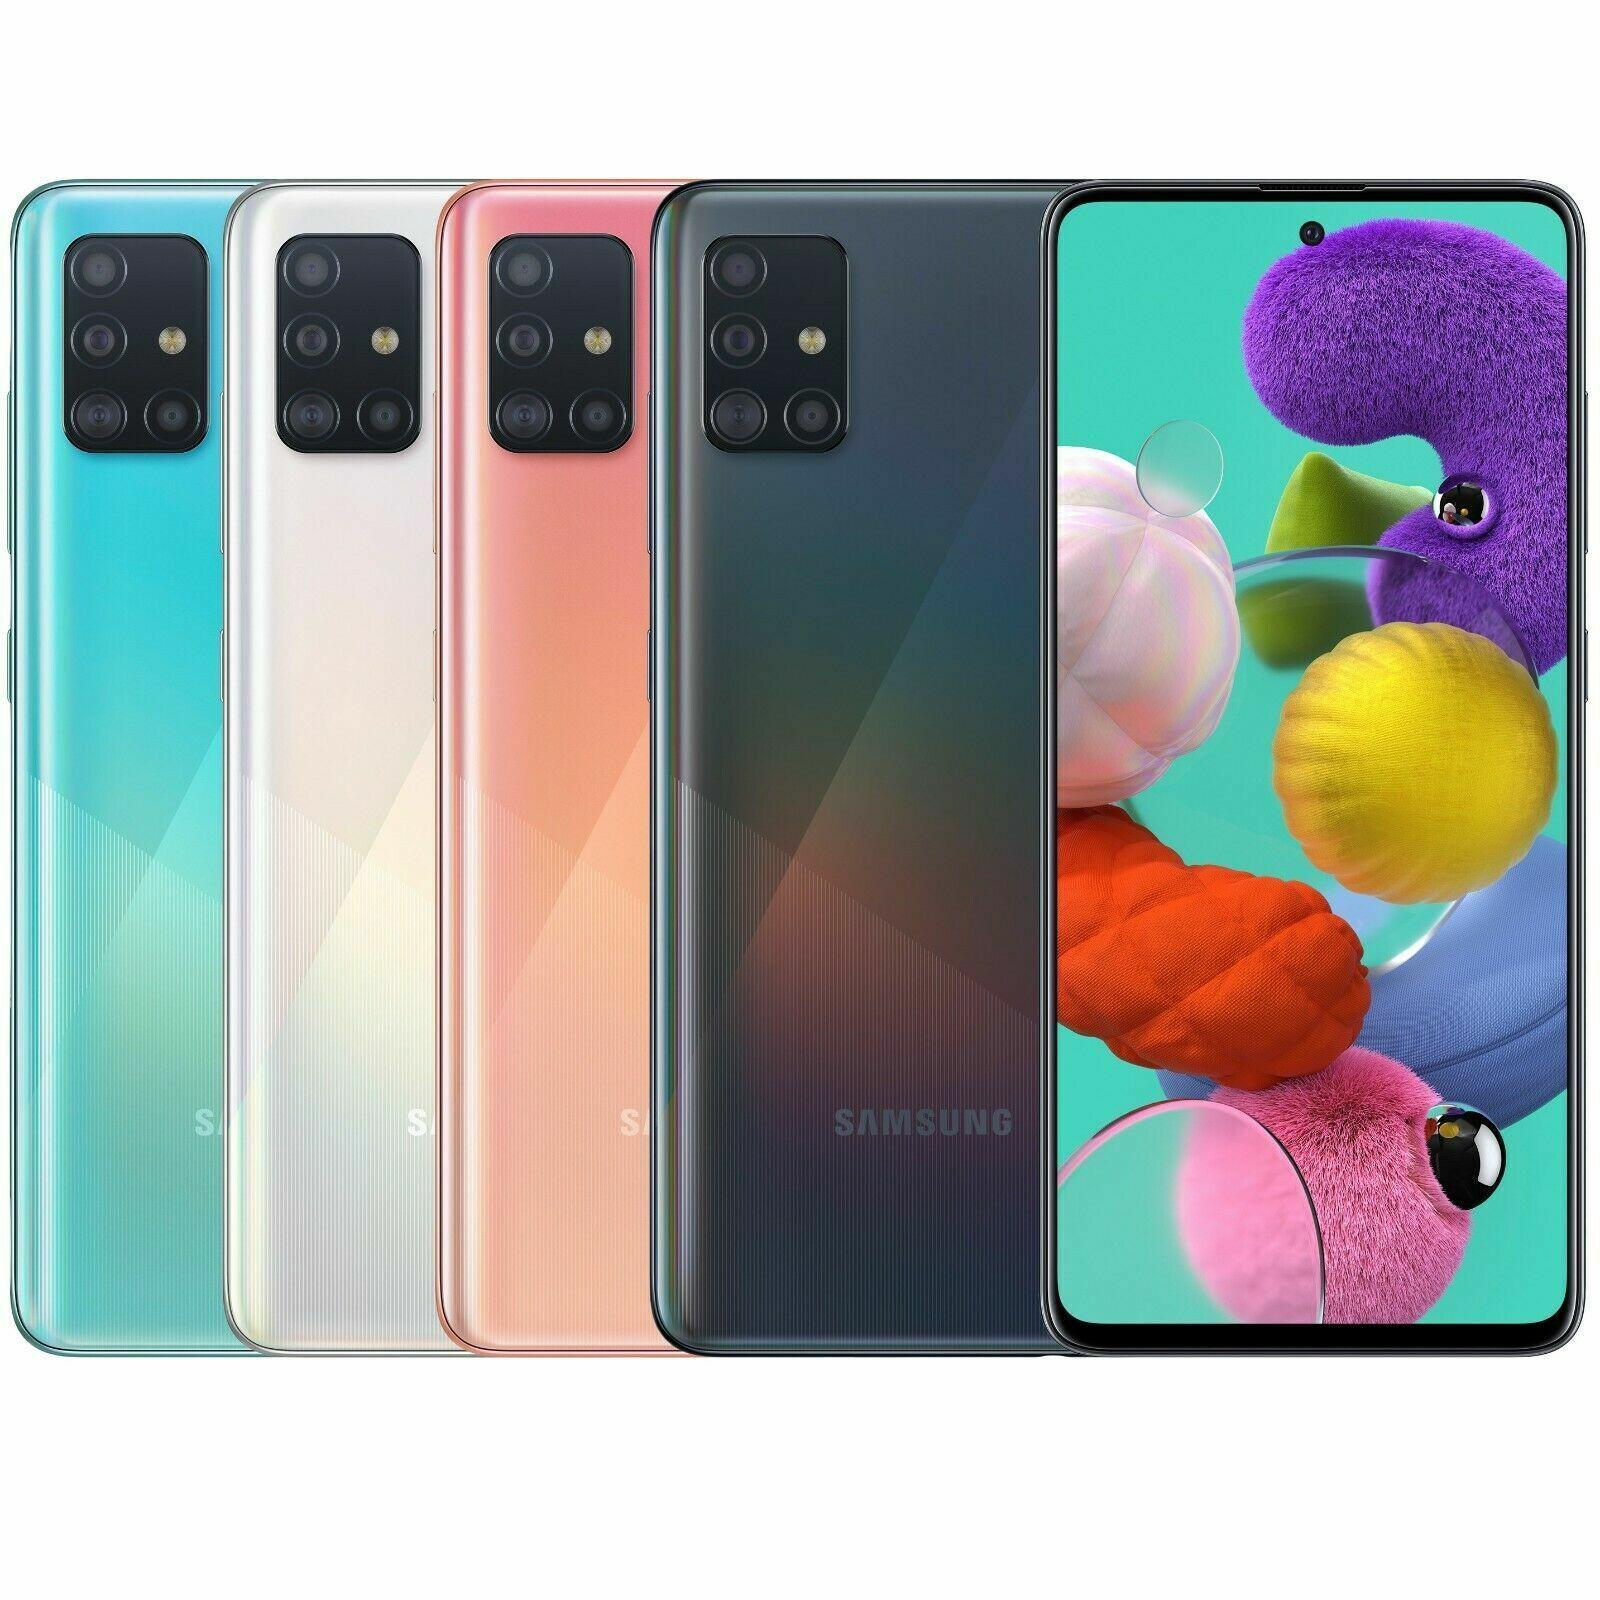 "Android Phone - Samsung Galaxy A51 A515F-DSN (Dual SIM 128GB/6GB 48MP 6.5"") Smartphone Unlocked"